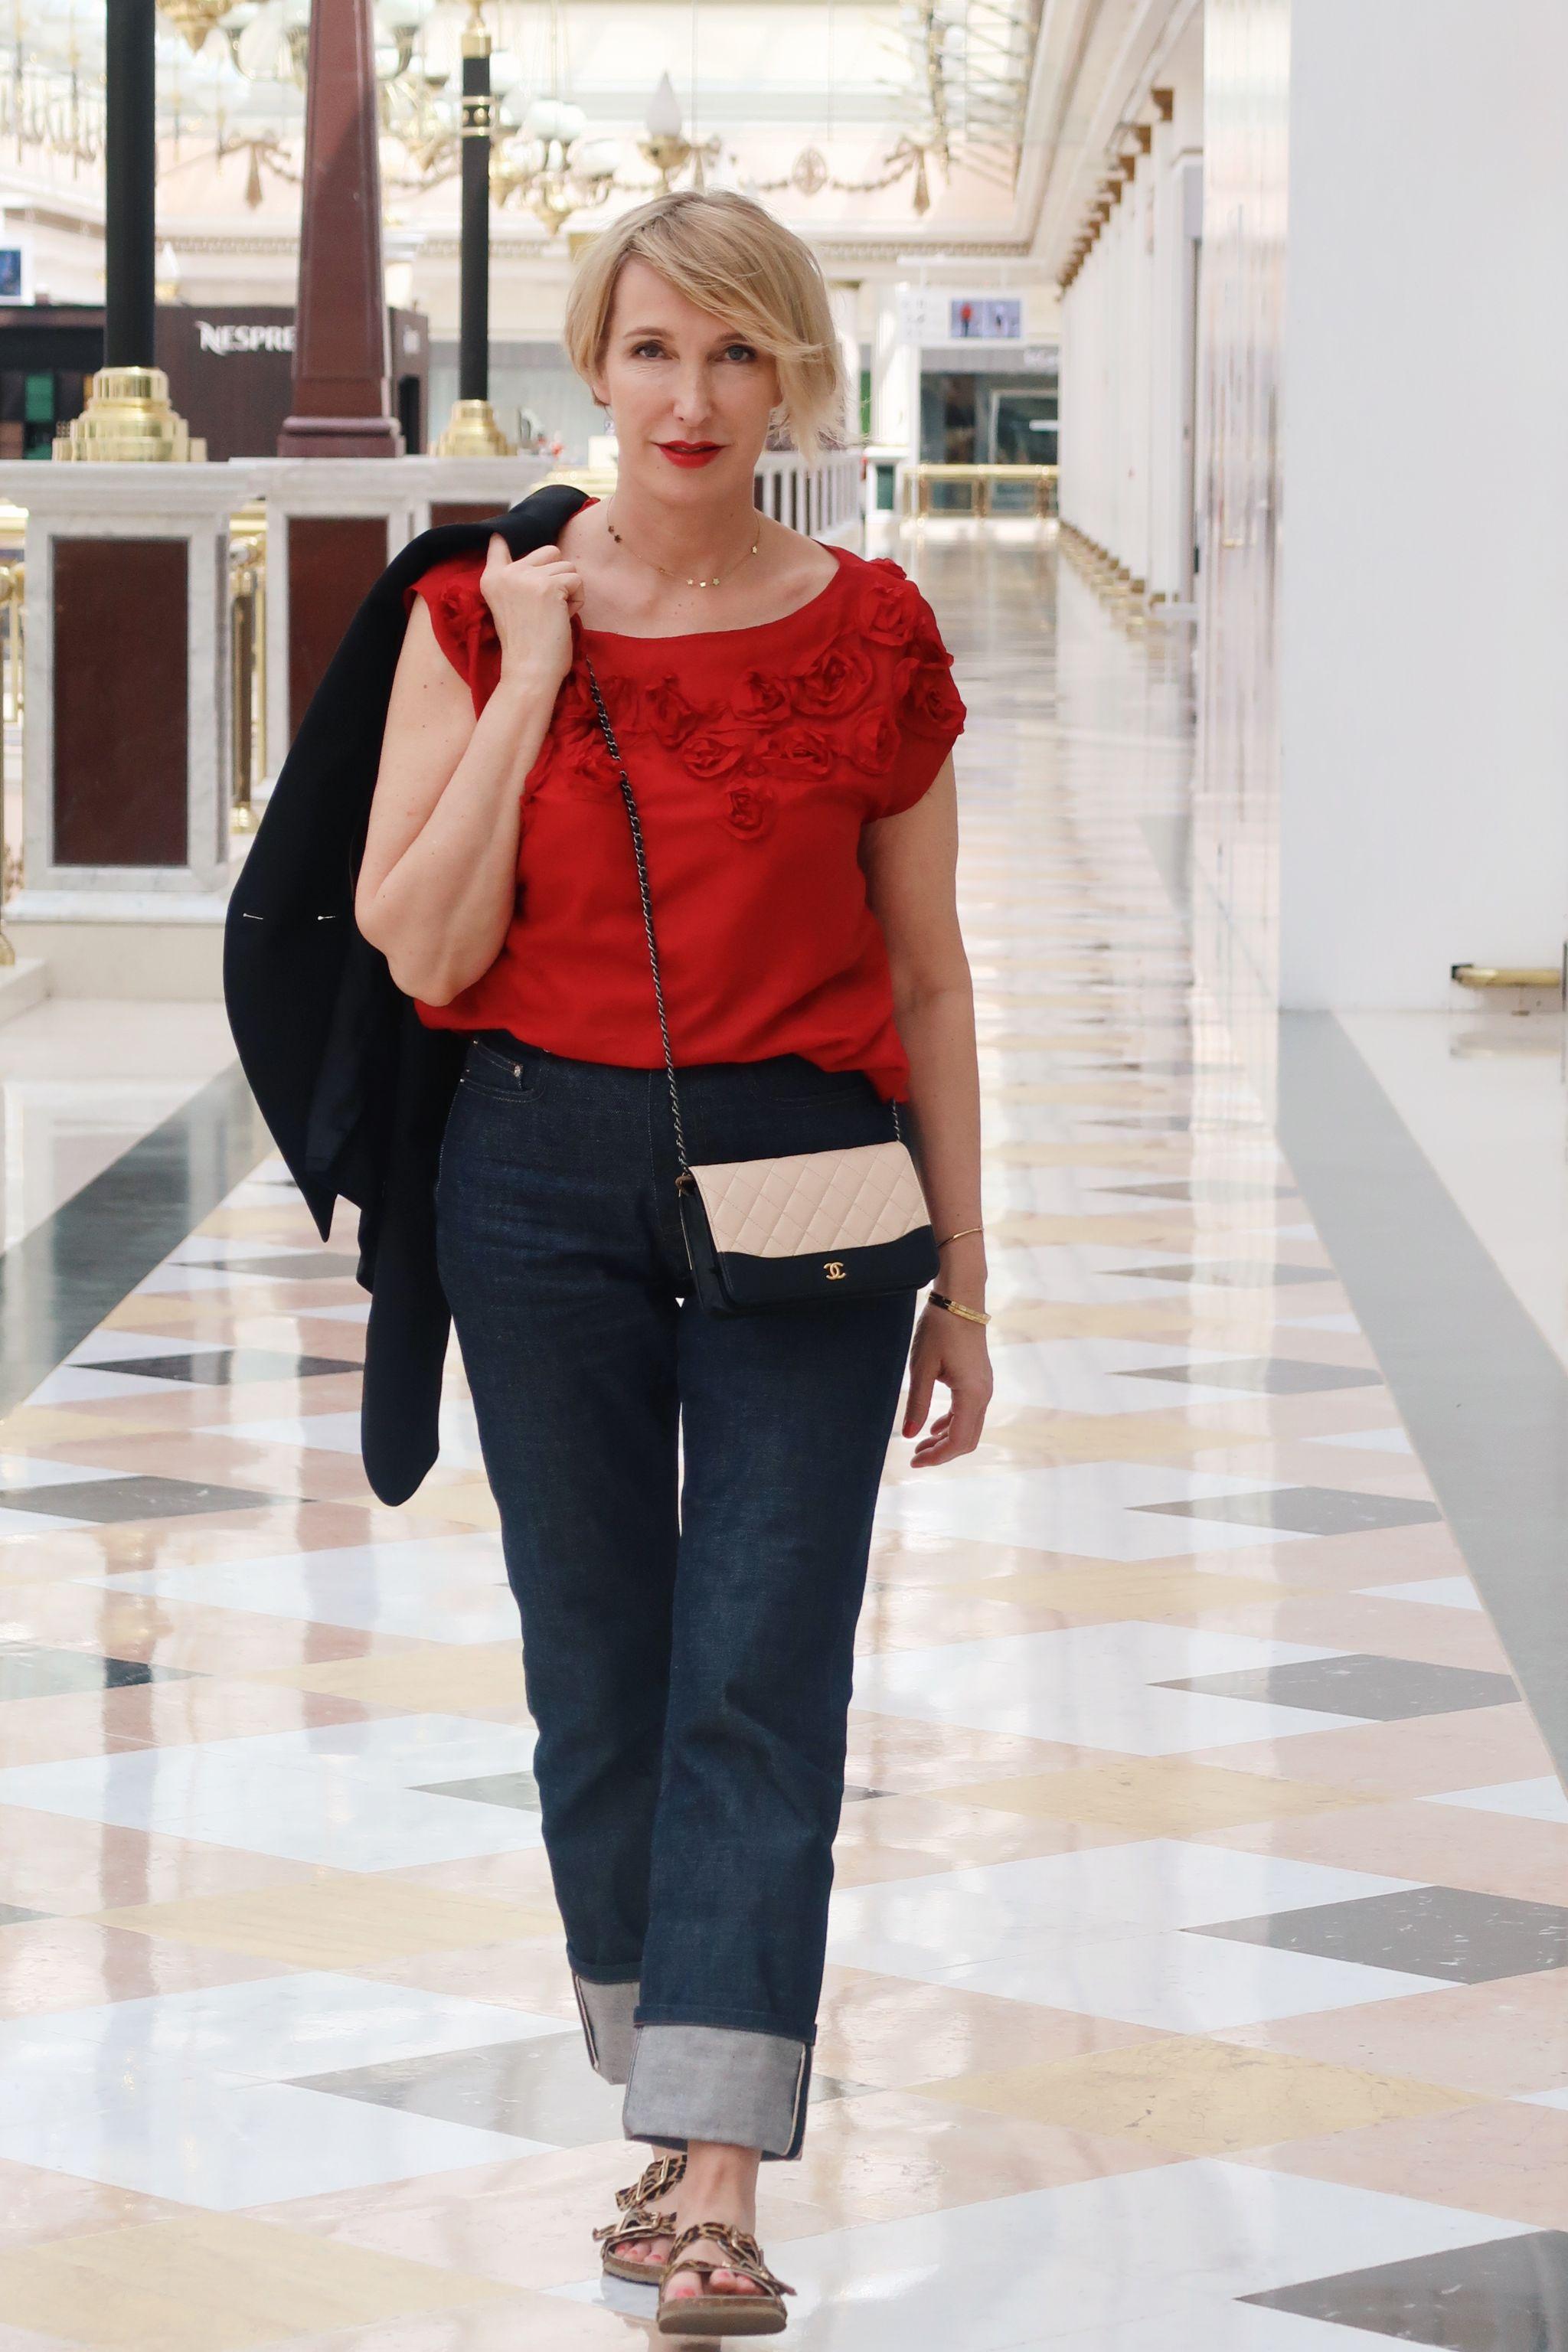 glamupyourlifestyle rote-seidenbluse girlfriendjeans birkenstock-sandalen birkenstock ue-40-mode ue-50-blog chanel-tasche